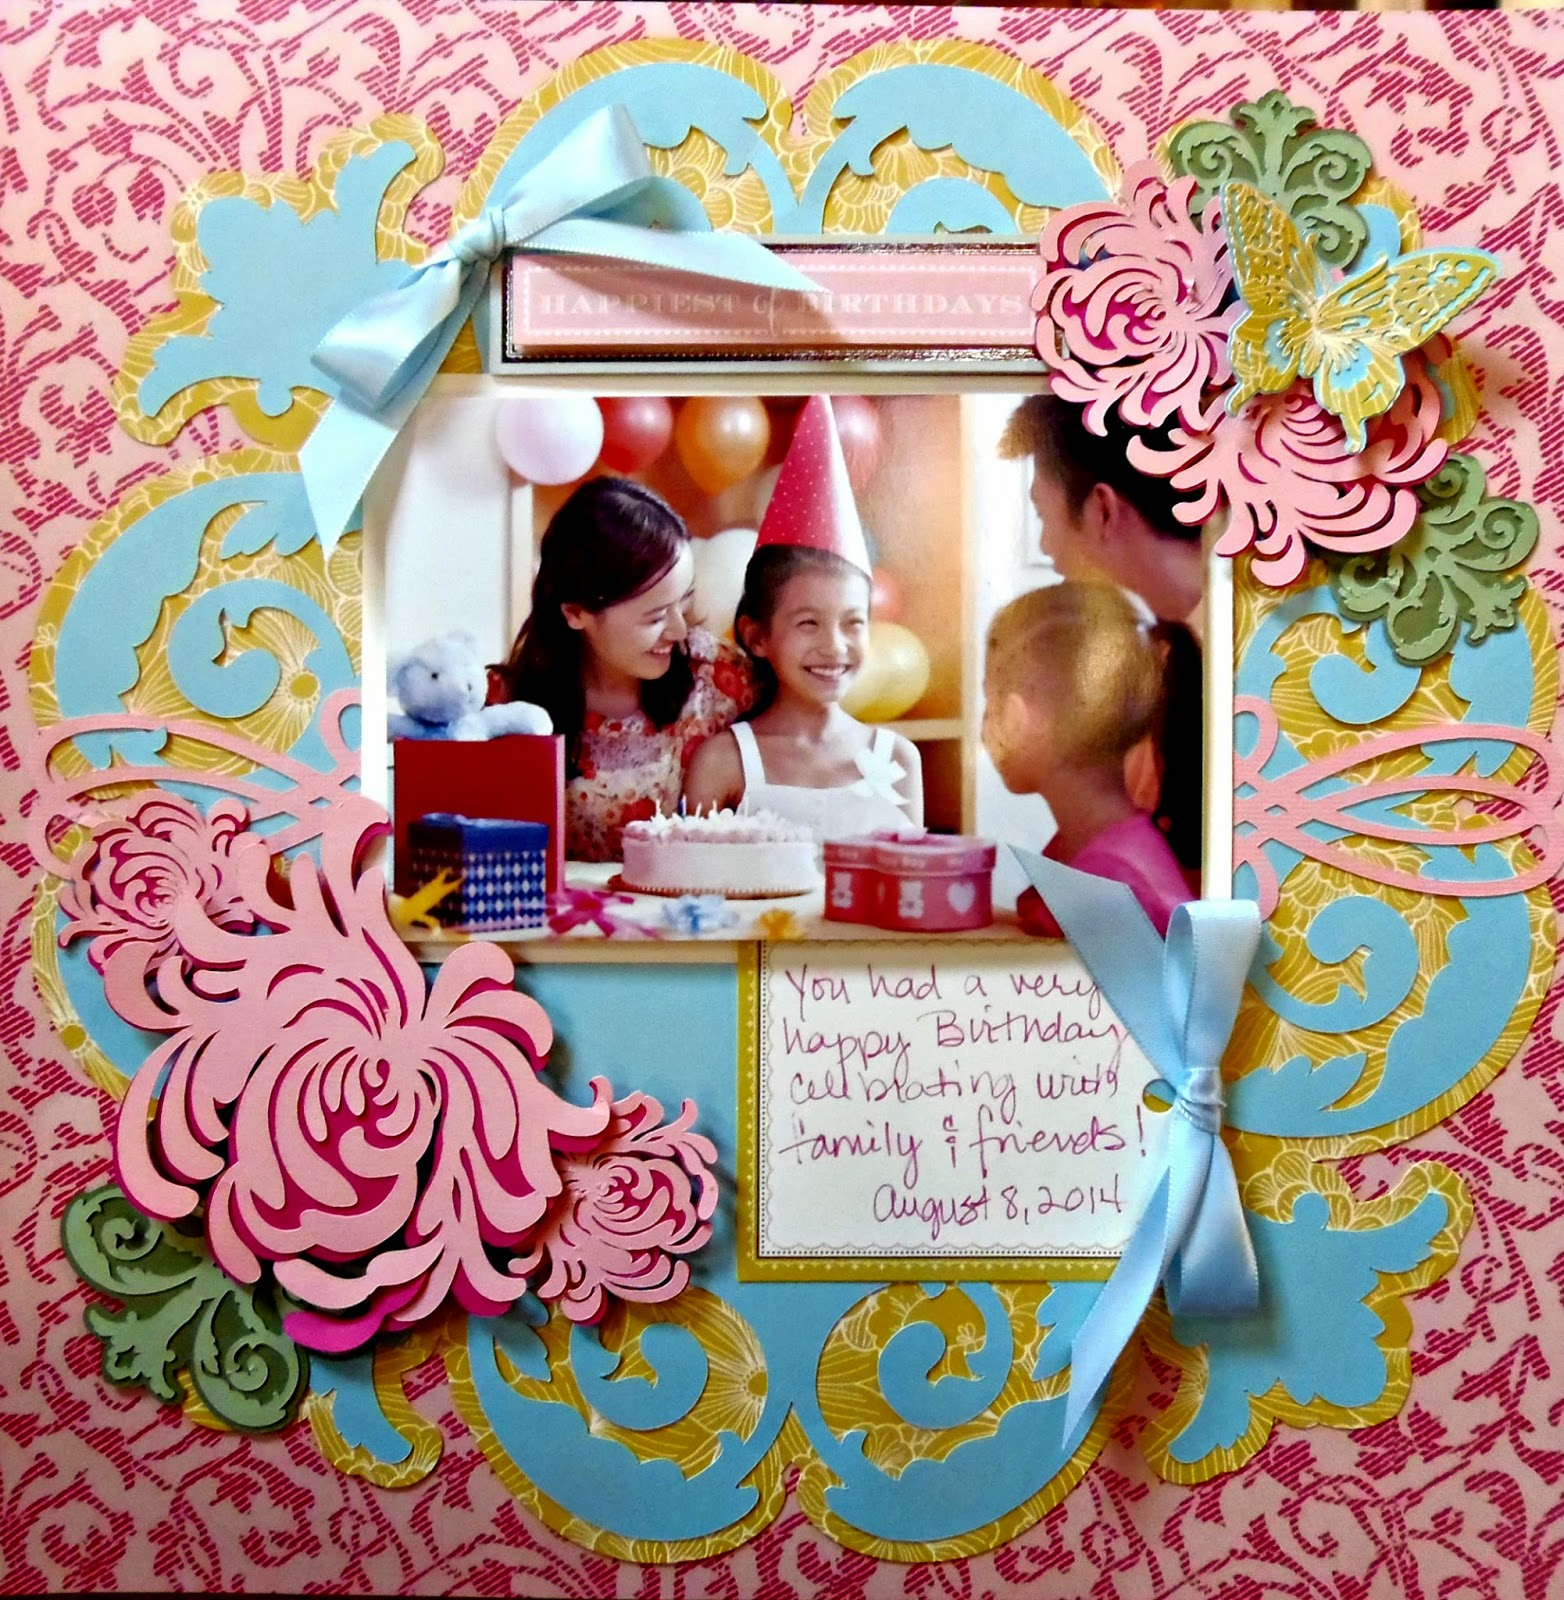 Juliet scrapbook ideas - My Pieces Of Time